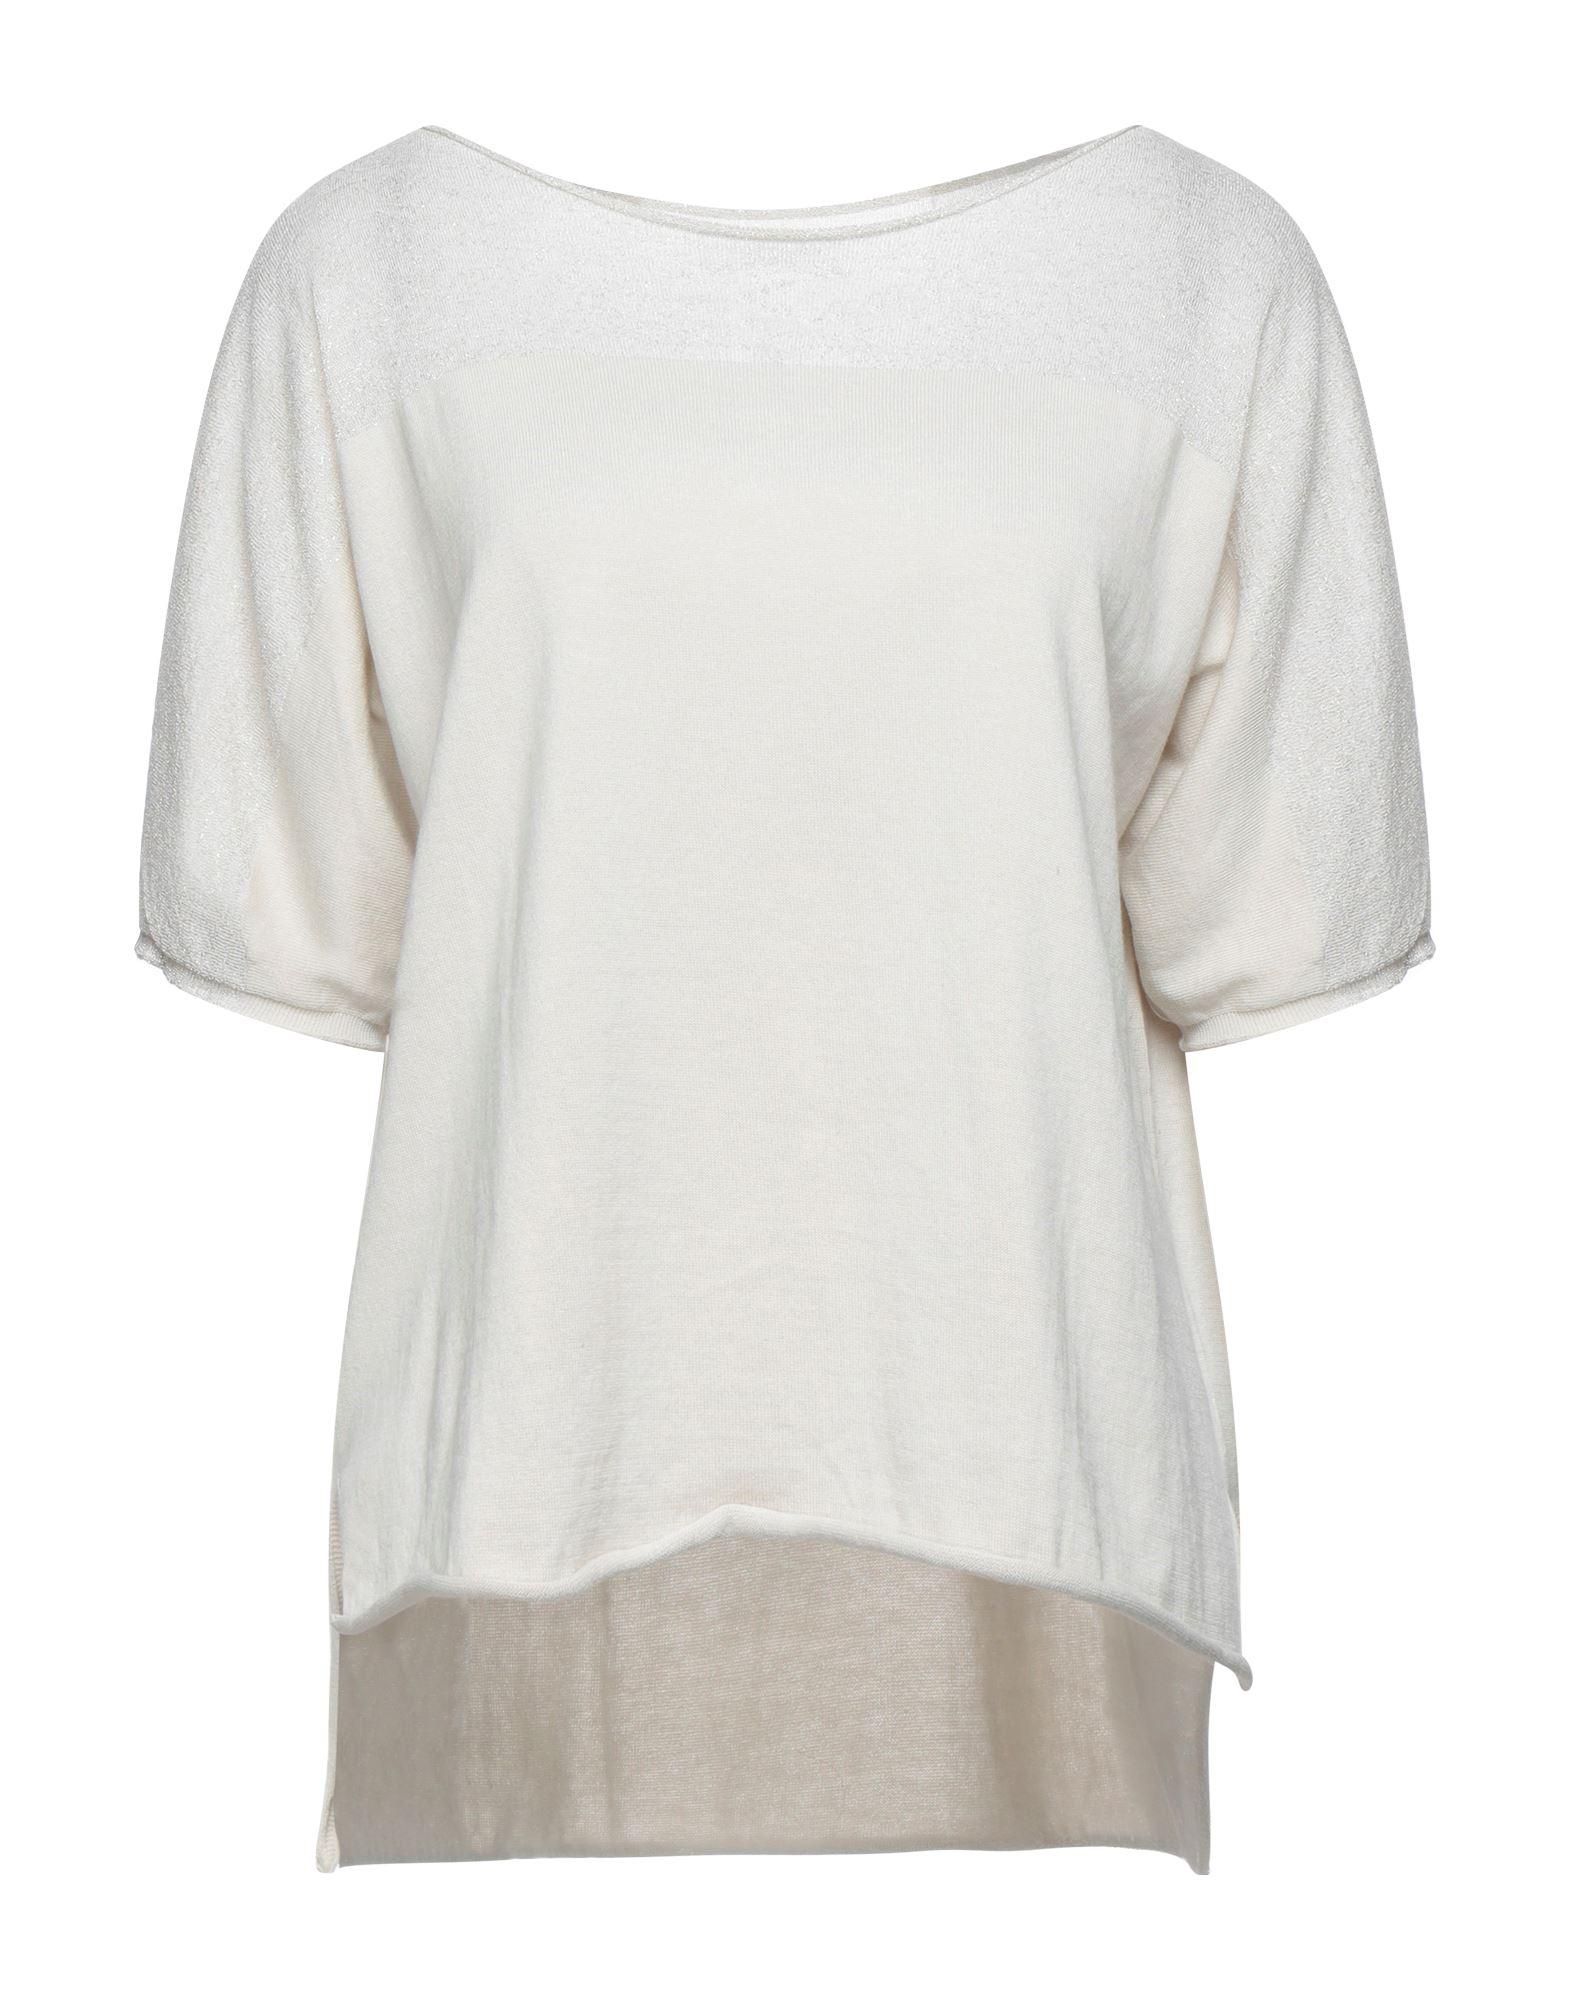 FABIANA FILIPPI Sweaters - Item 39703452